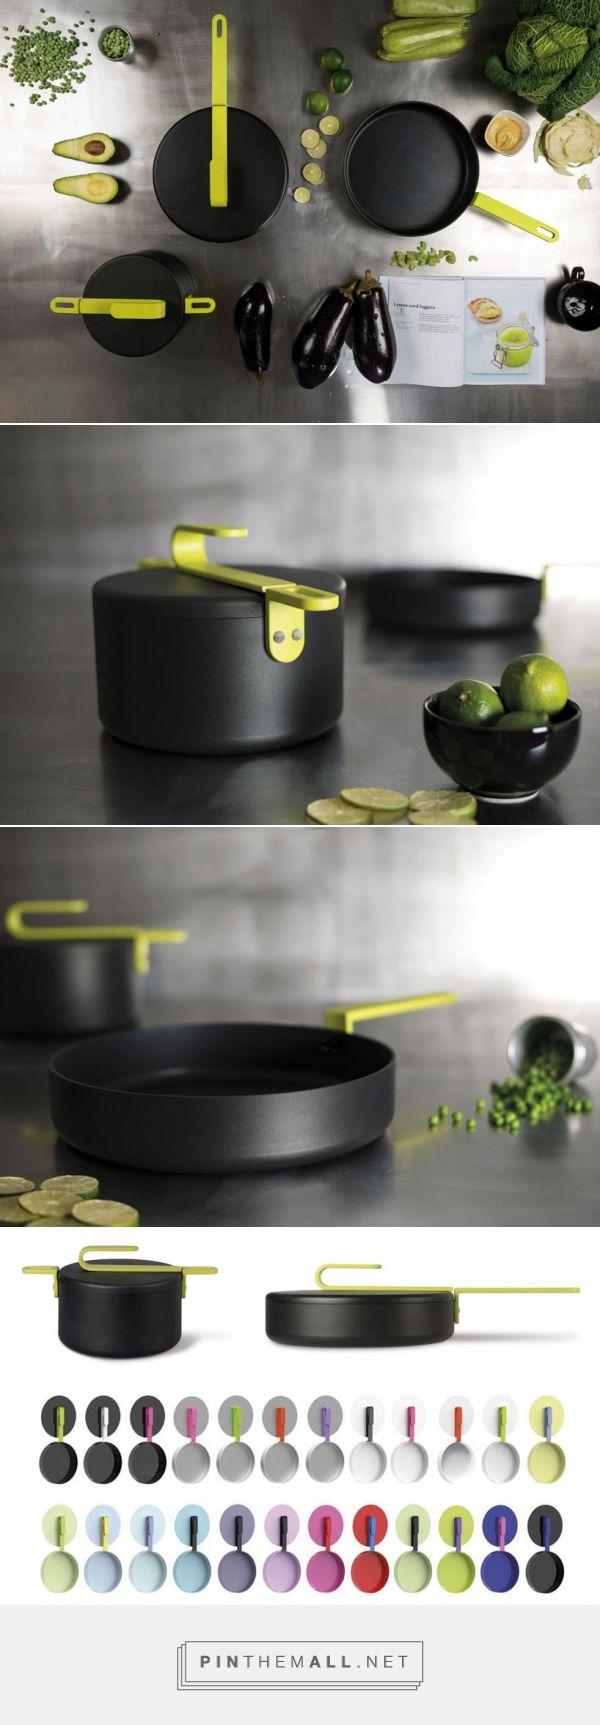 HOOK cookware collection | designed by Karim Rashid for TVS #cookware #KarimRashid